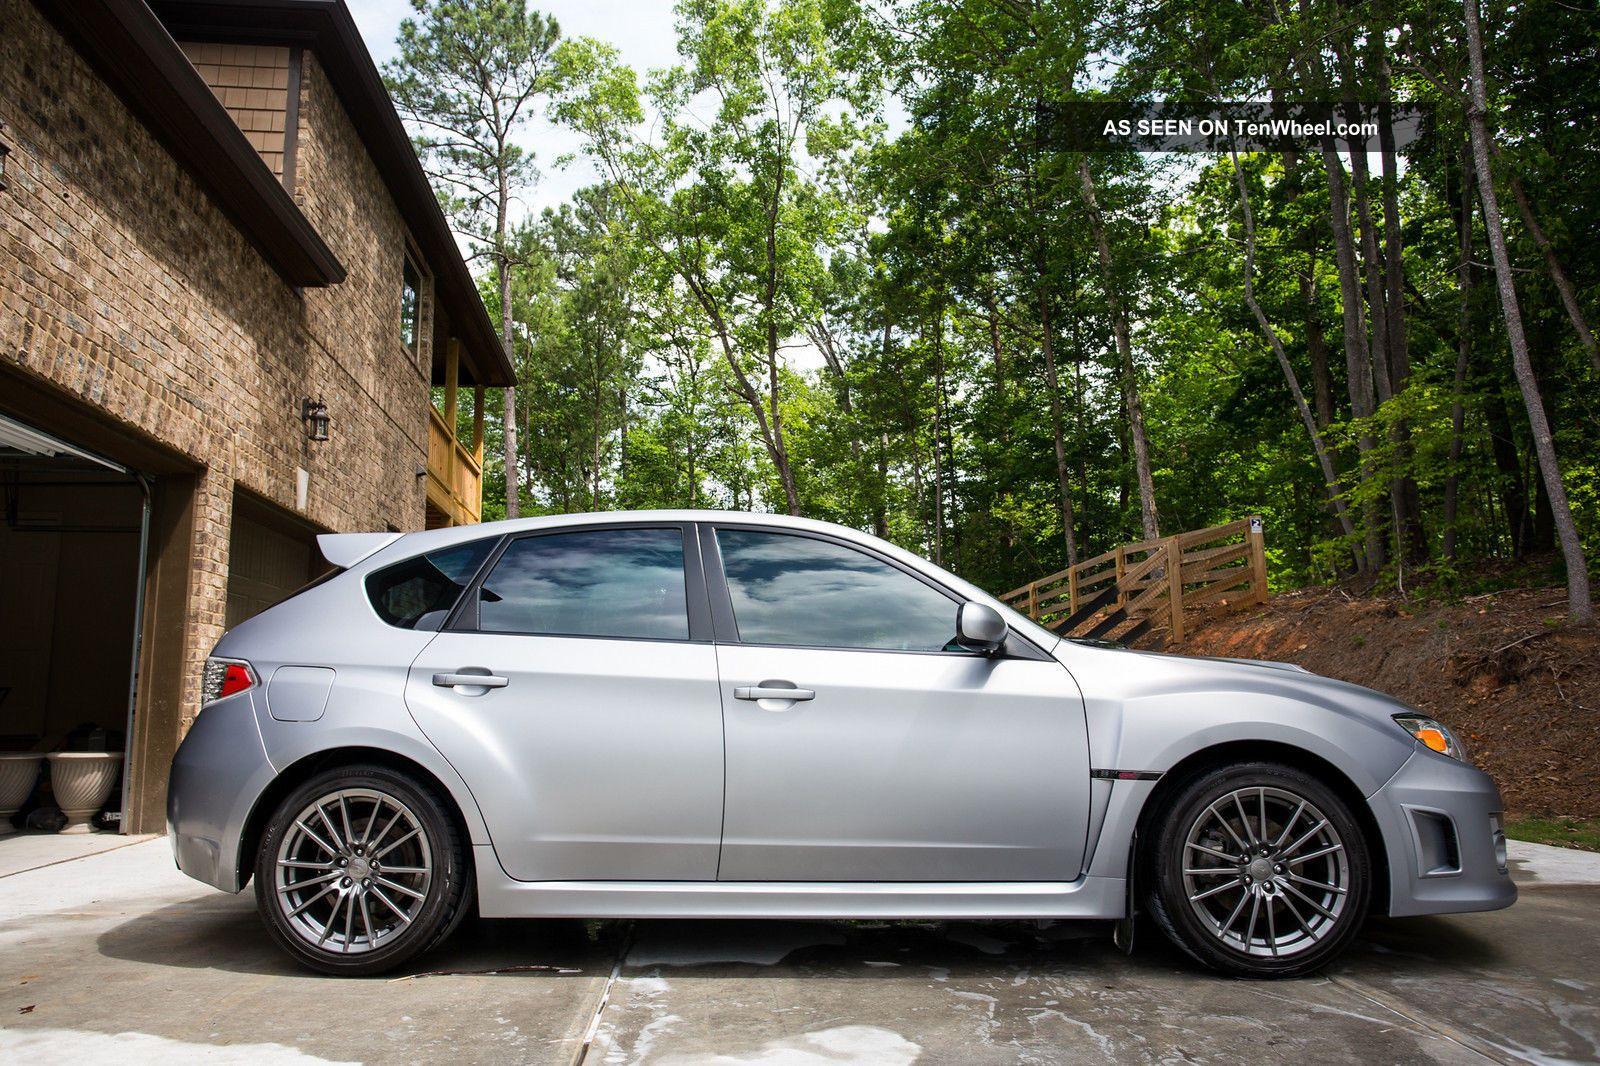 2011 Subaru Impreza Wrx Premium Wagon Hatch Matte And Modded